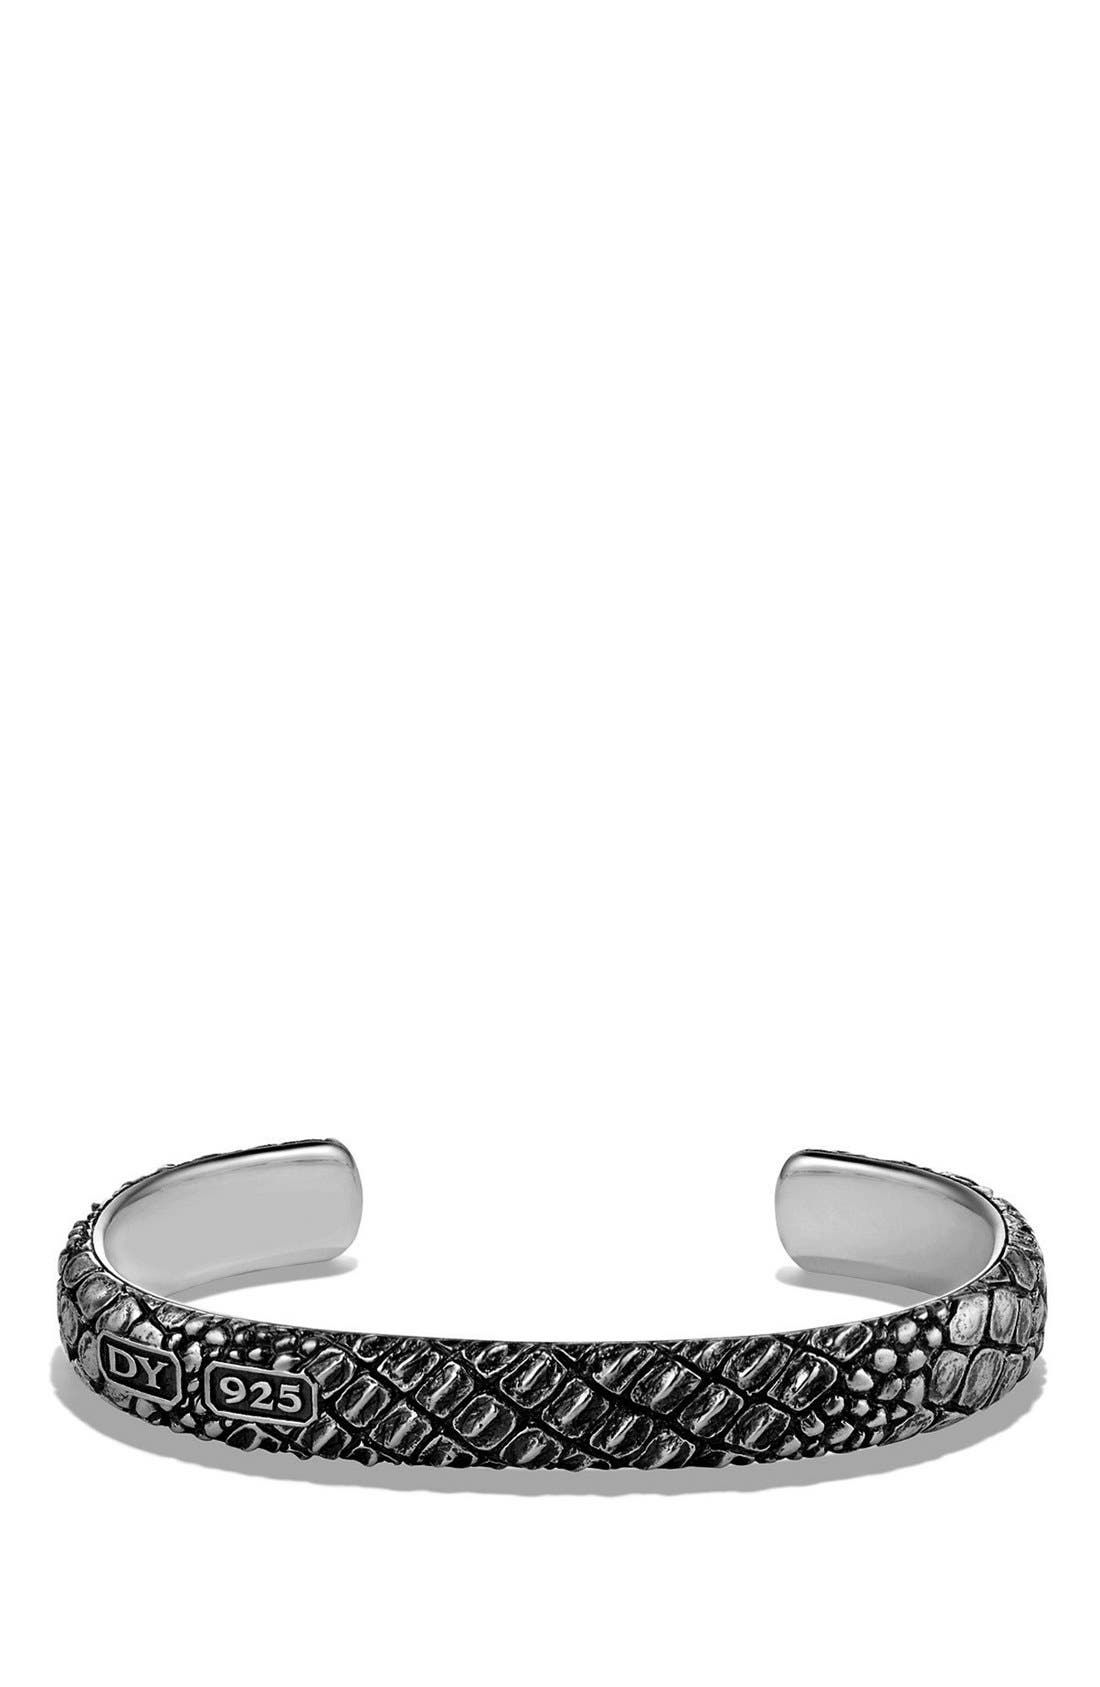 'Naturals' Gator Cuff Bracelet,                             Main thumbnail 1, color,                             SILVER